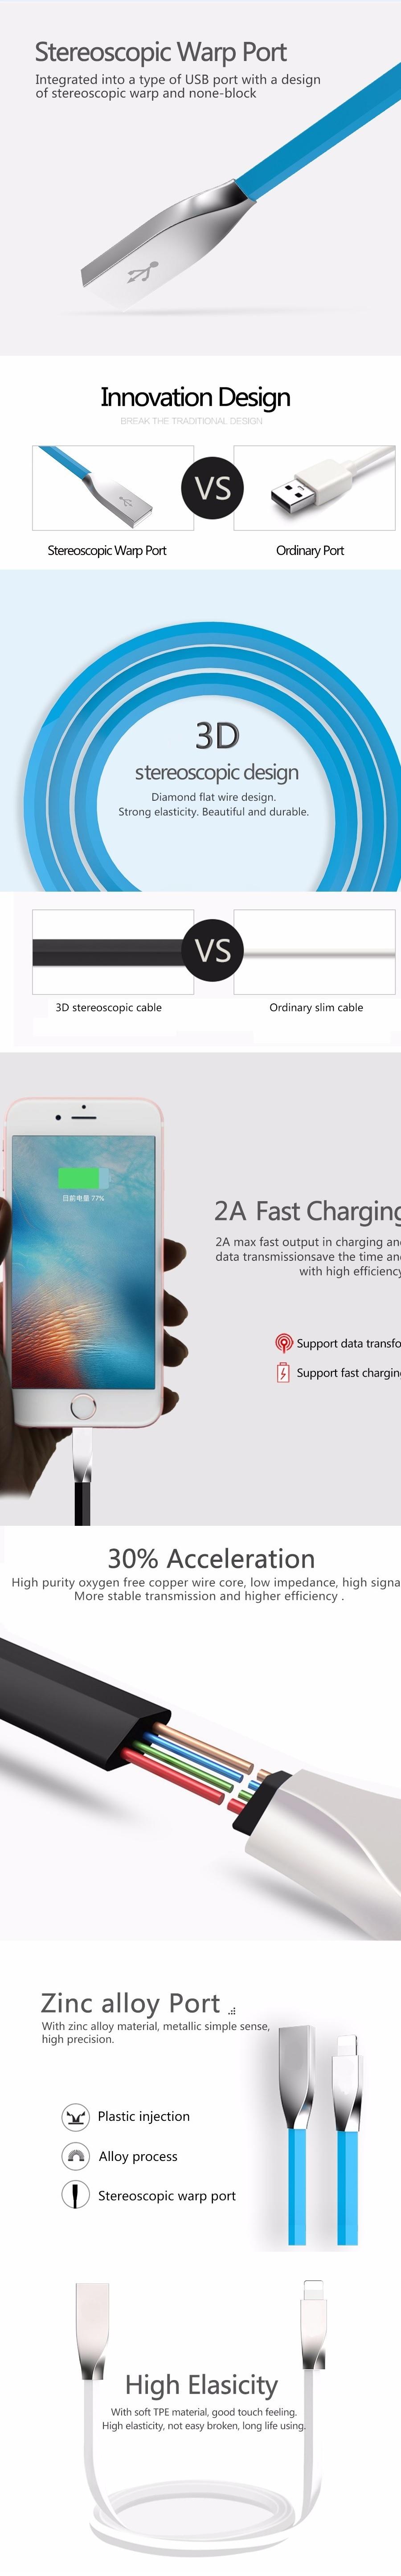 NewBee 1m Pink Apple Premium Zinc Alloy USB Lightning Charging Cable iPhone iPad